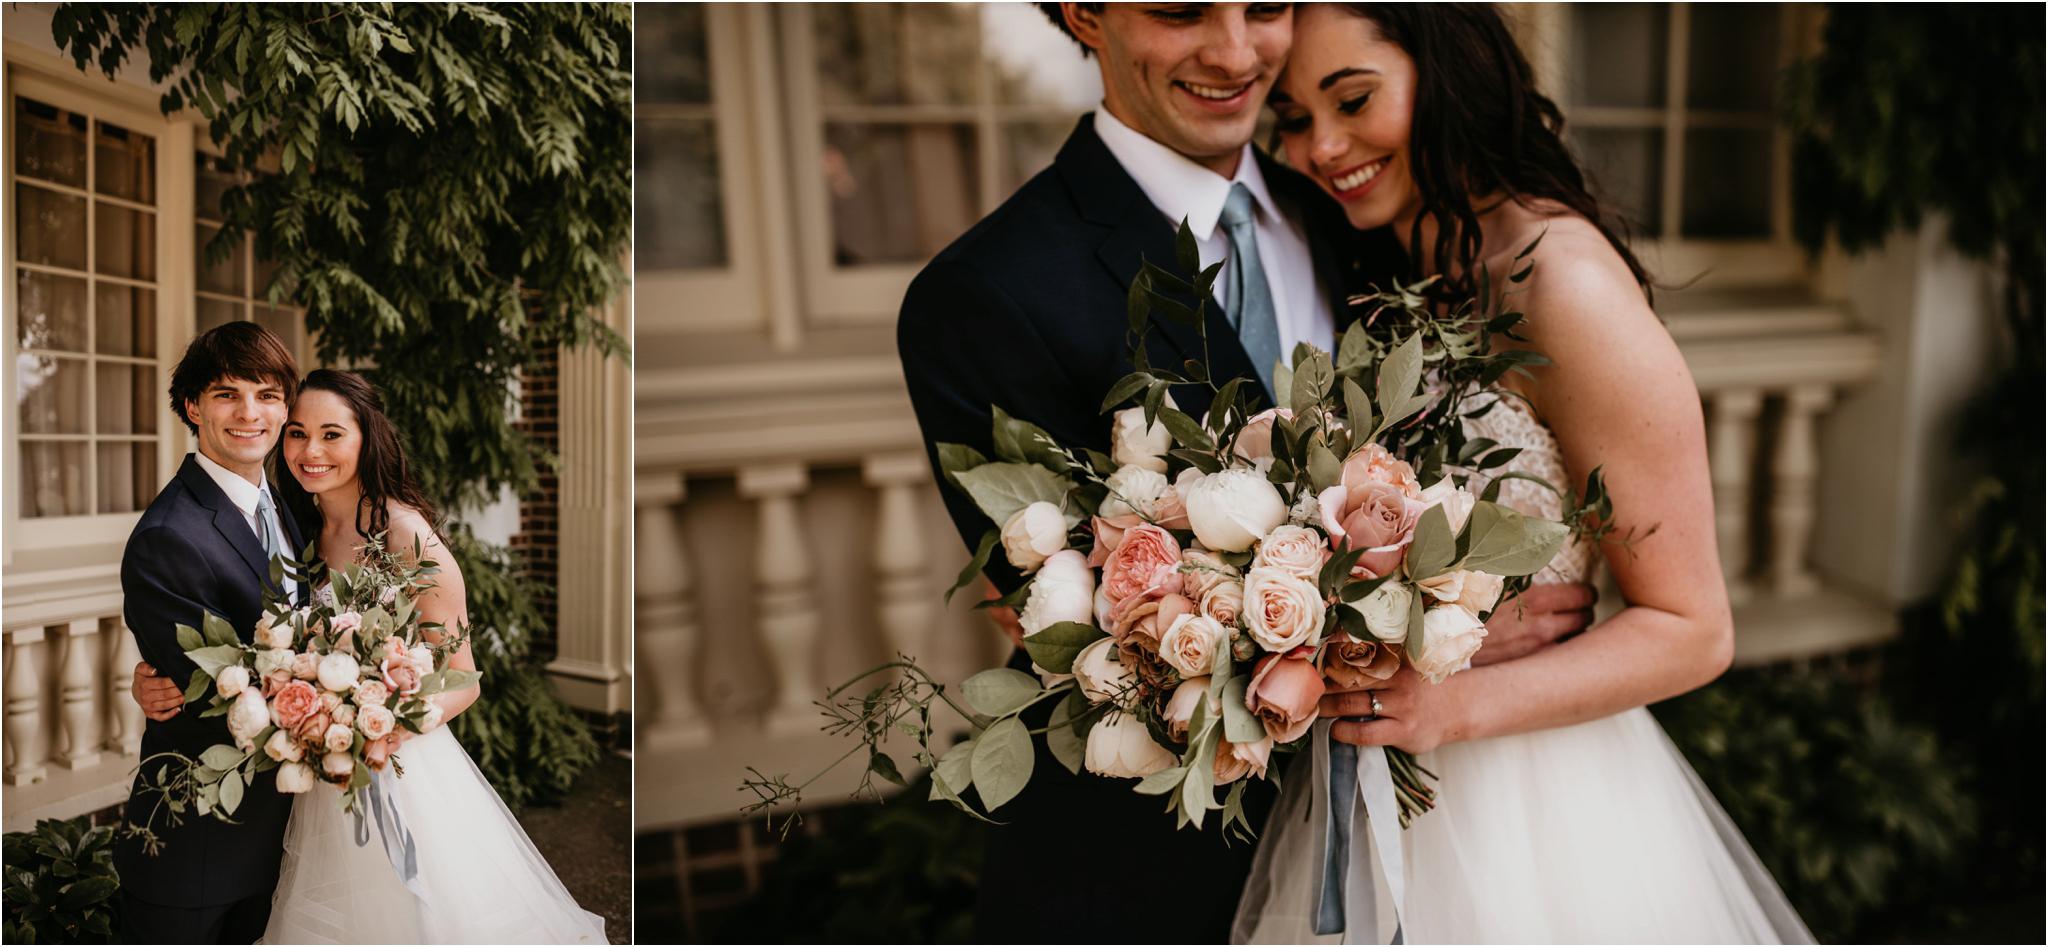 chance-and-ondrea-lairmont-manor-wedding-seattle-photographer-040.jpg